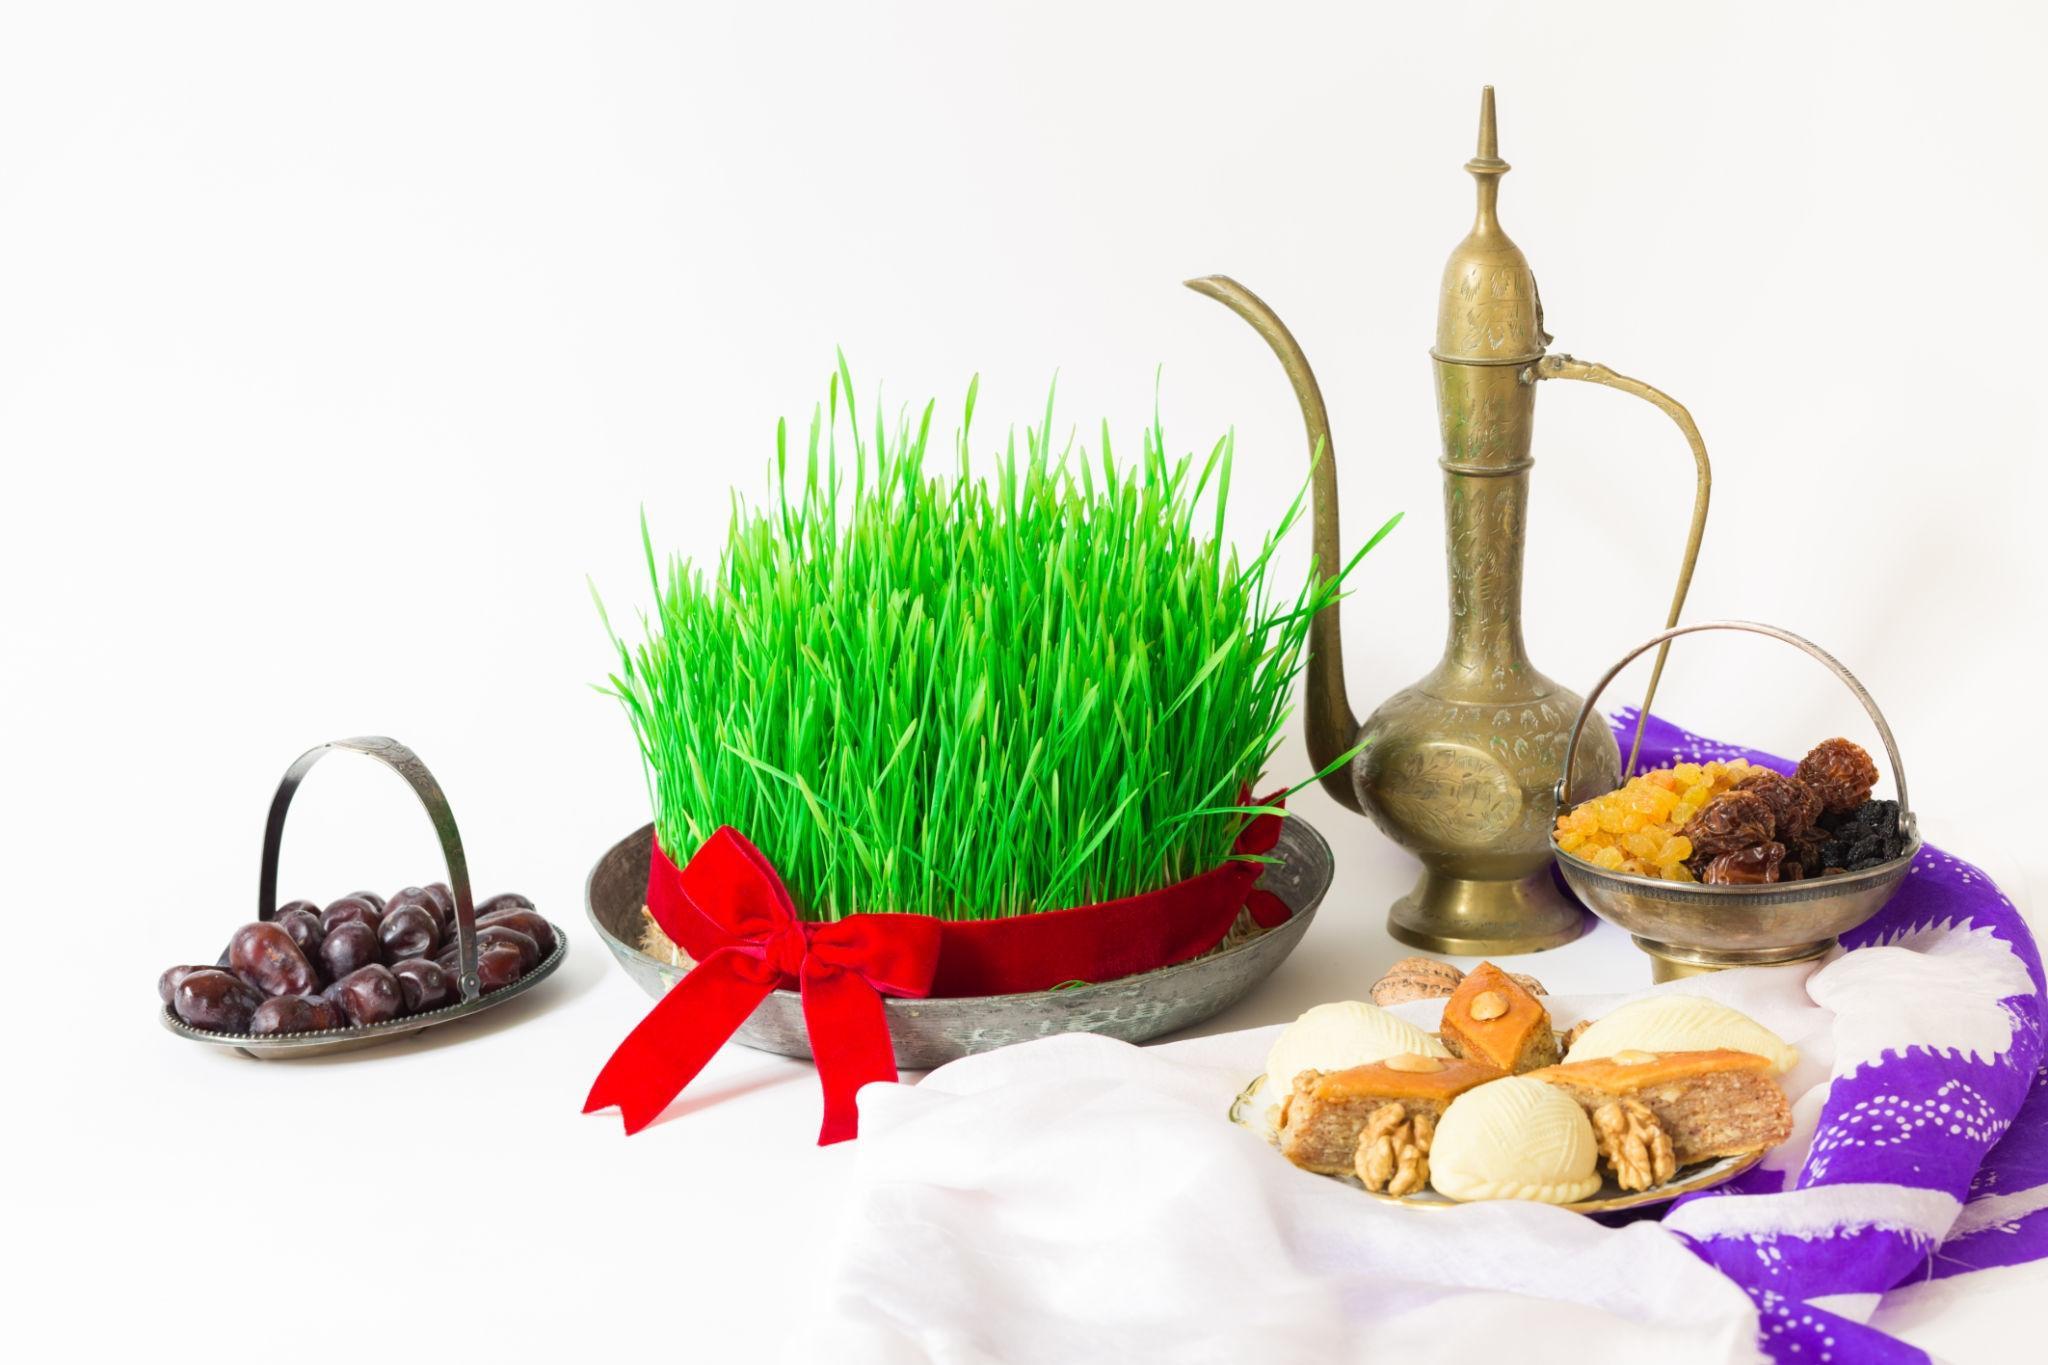 Noruwz Photo noruz Image nowruz